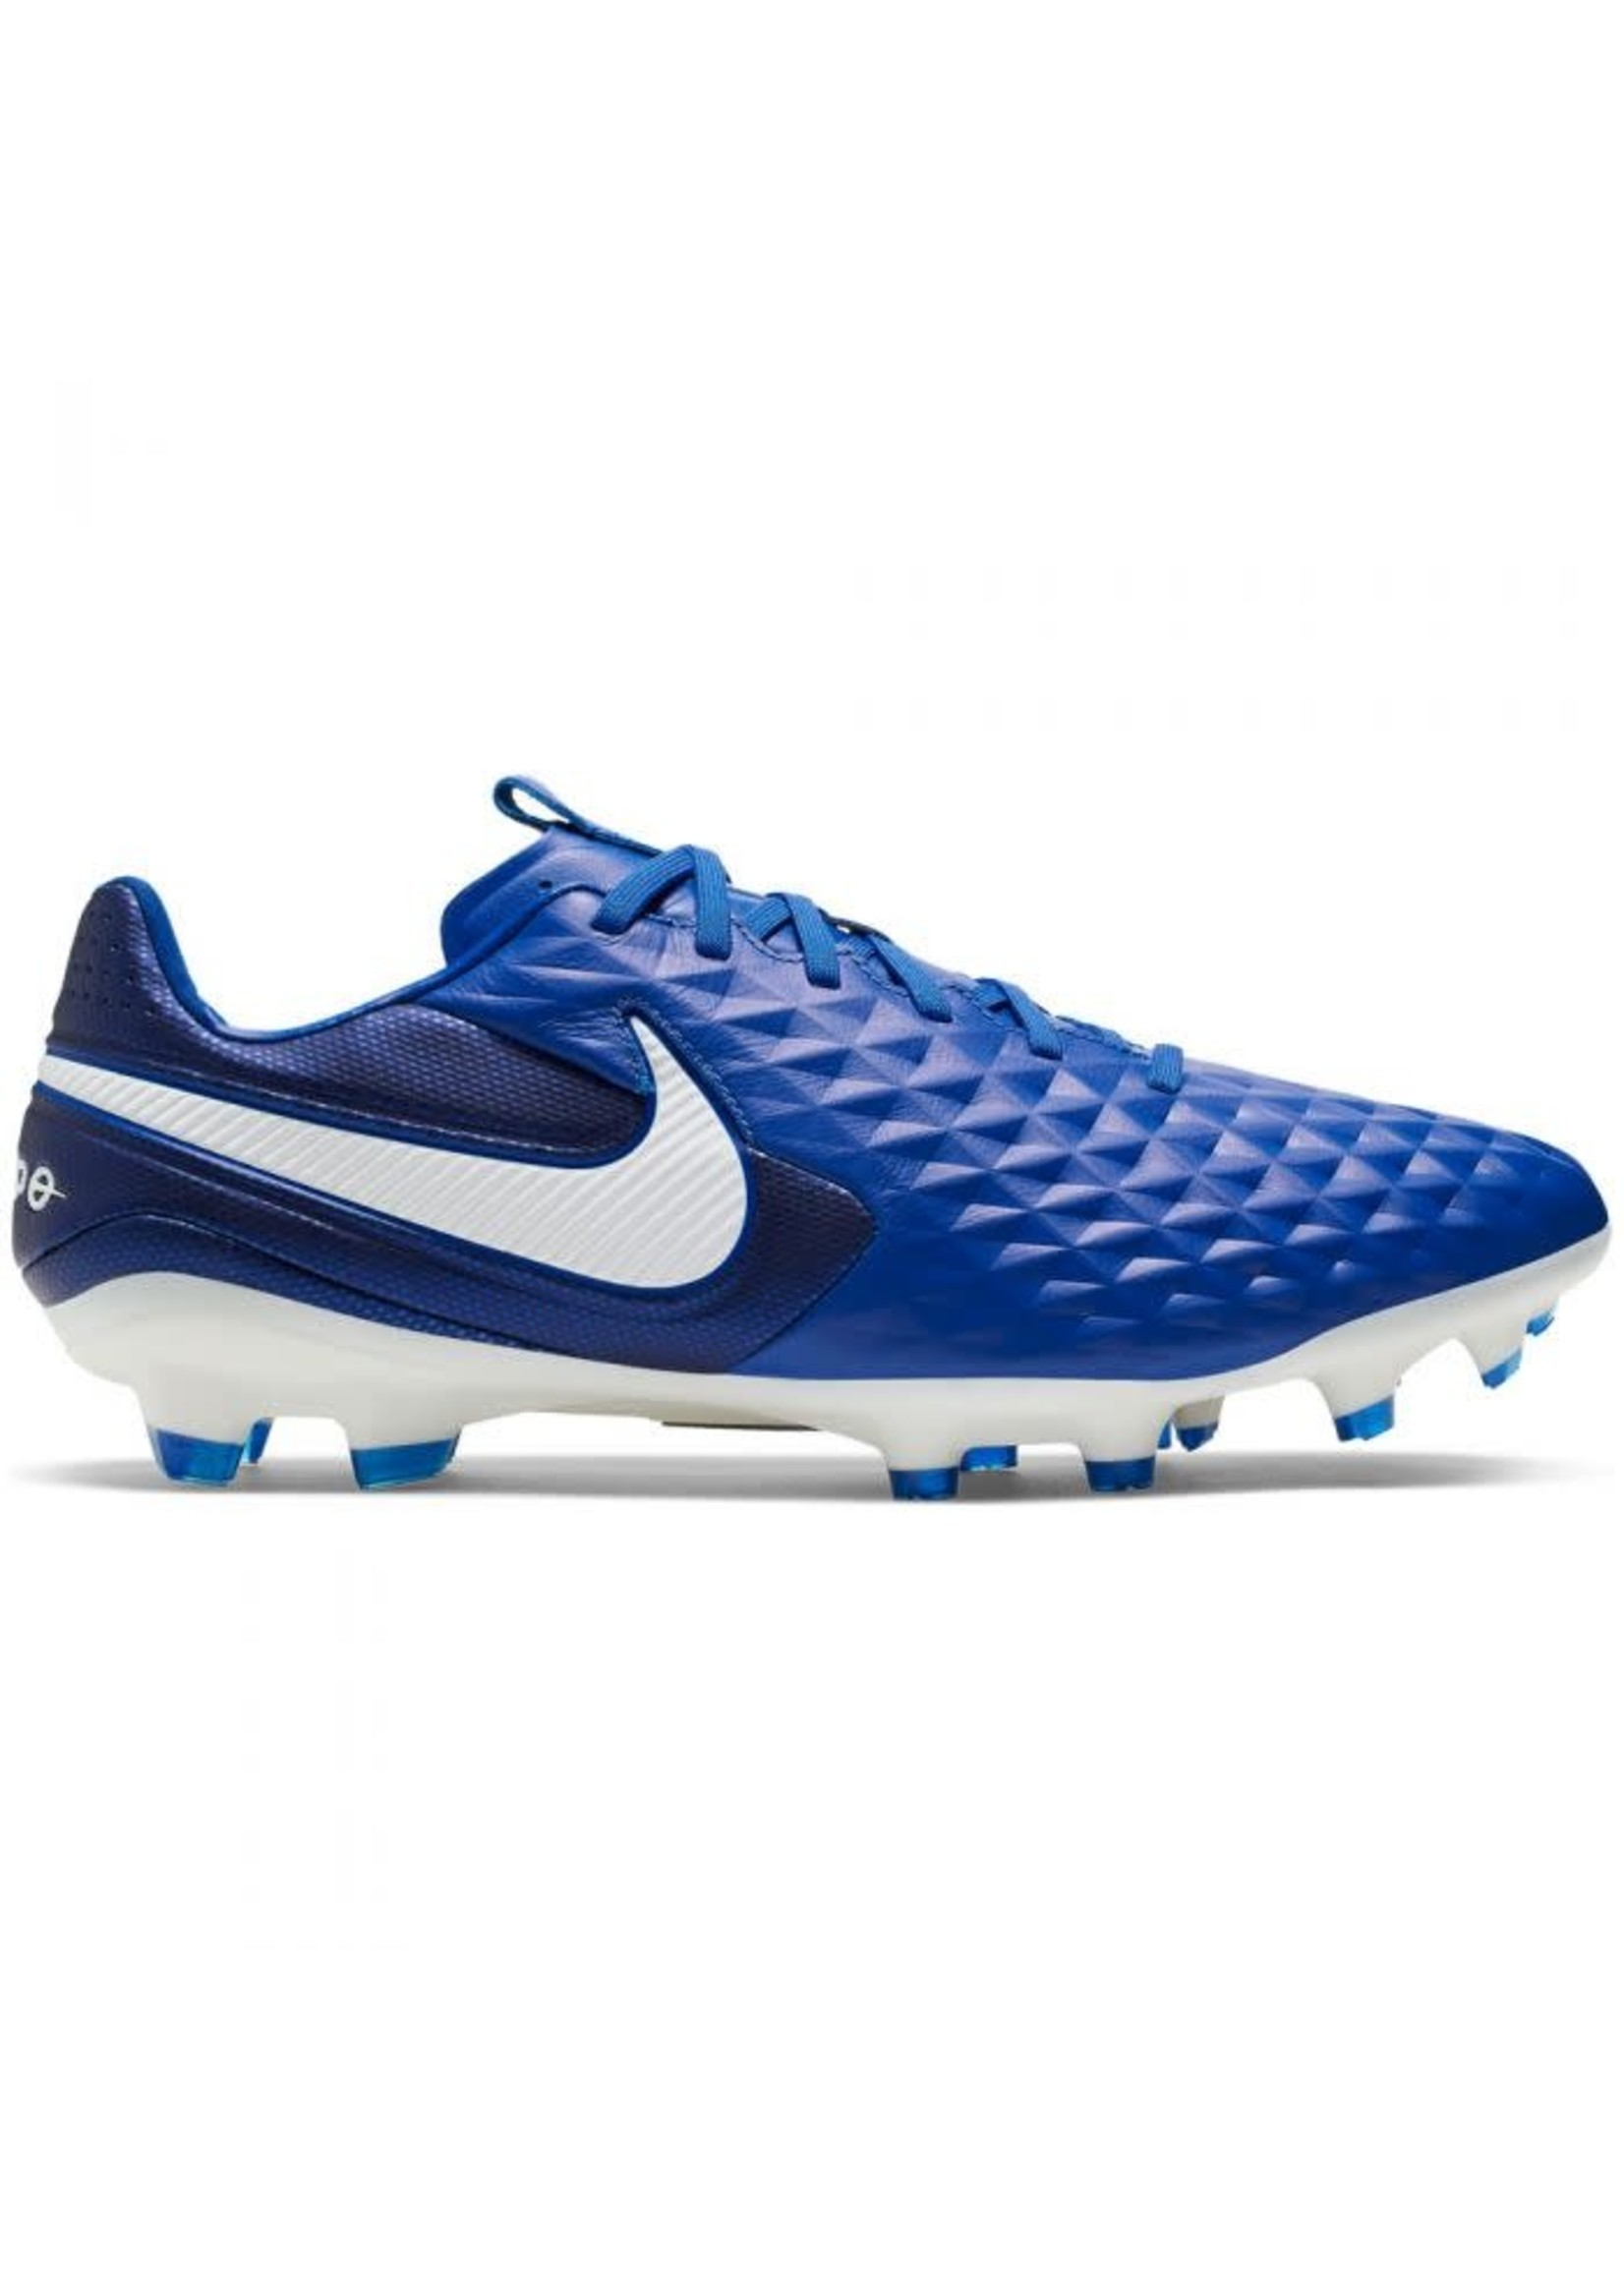 Nike Legend 8 Pro FG - Blue/White